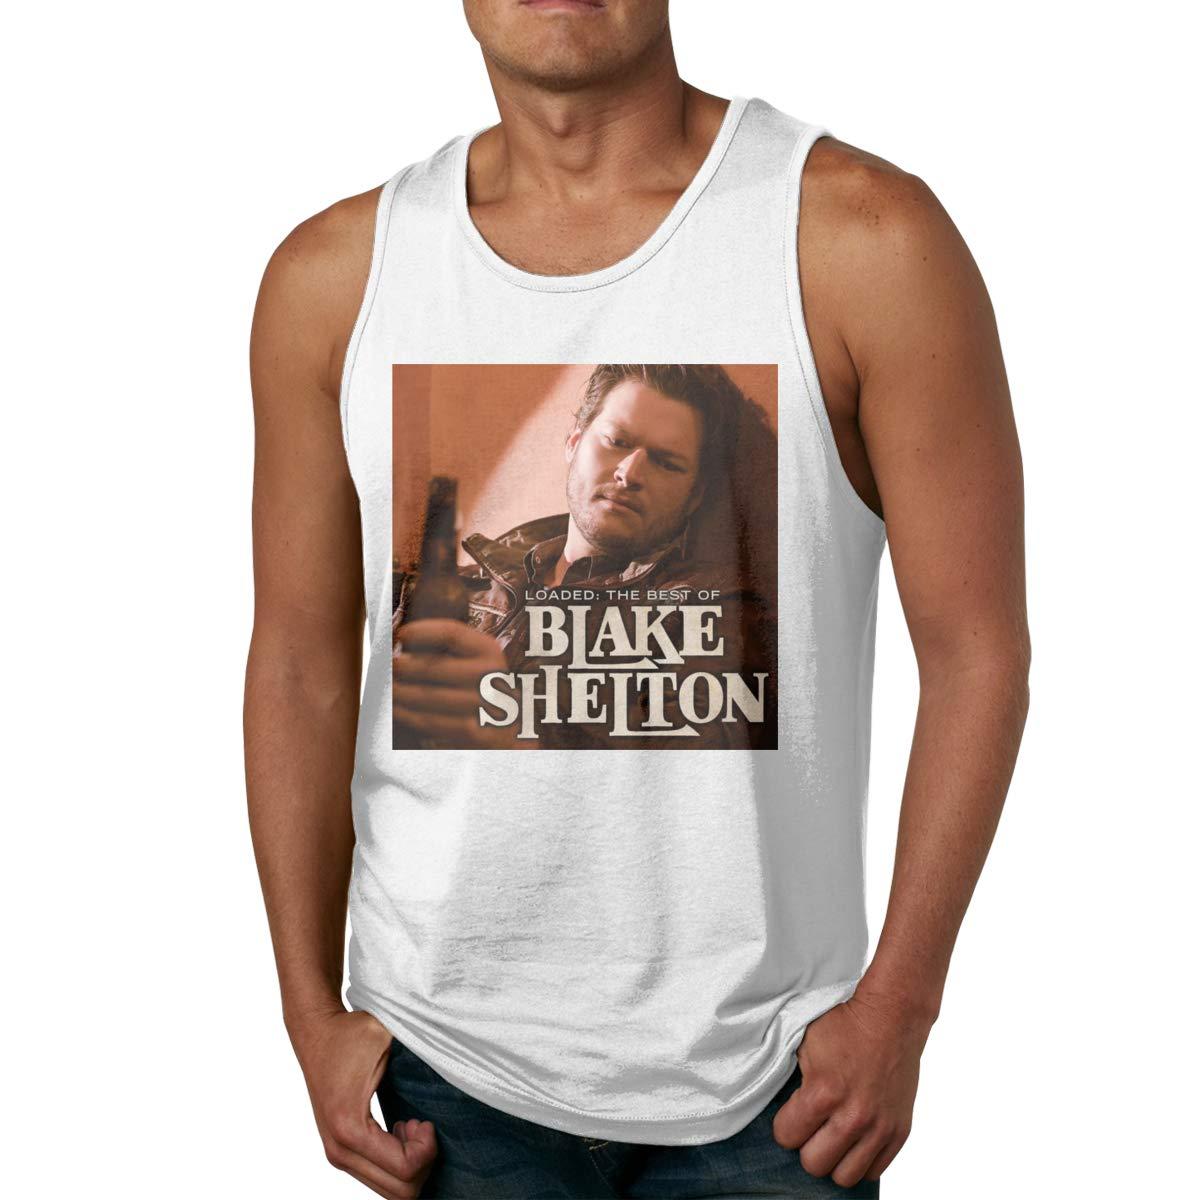 Blake Shelton Loaded The Best Of Blake Shelton Athletic Muscle Sleeveless Tank Top T-shirt